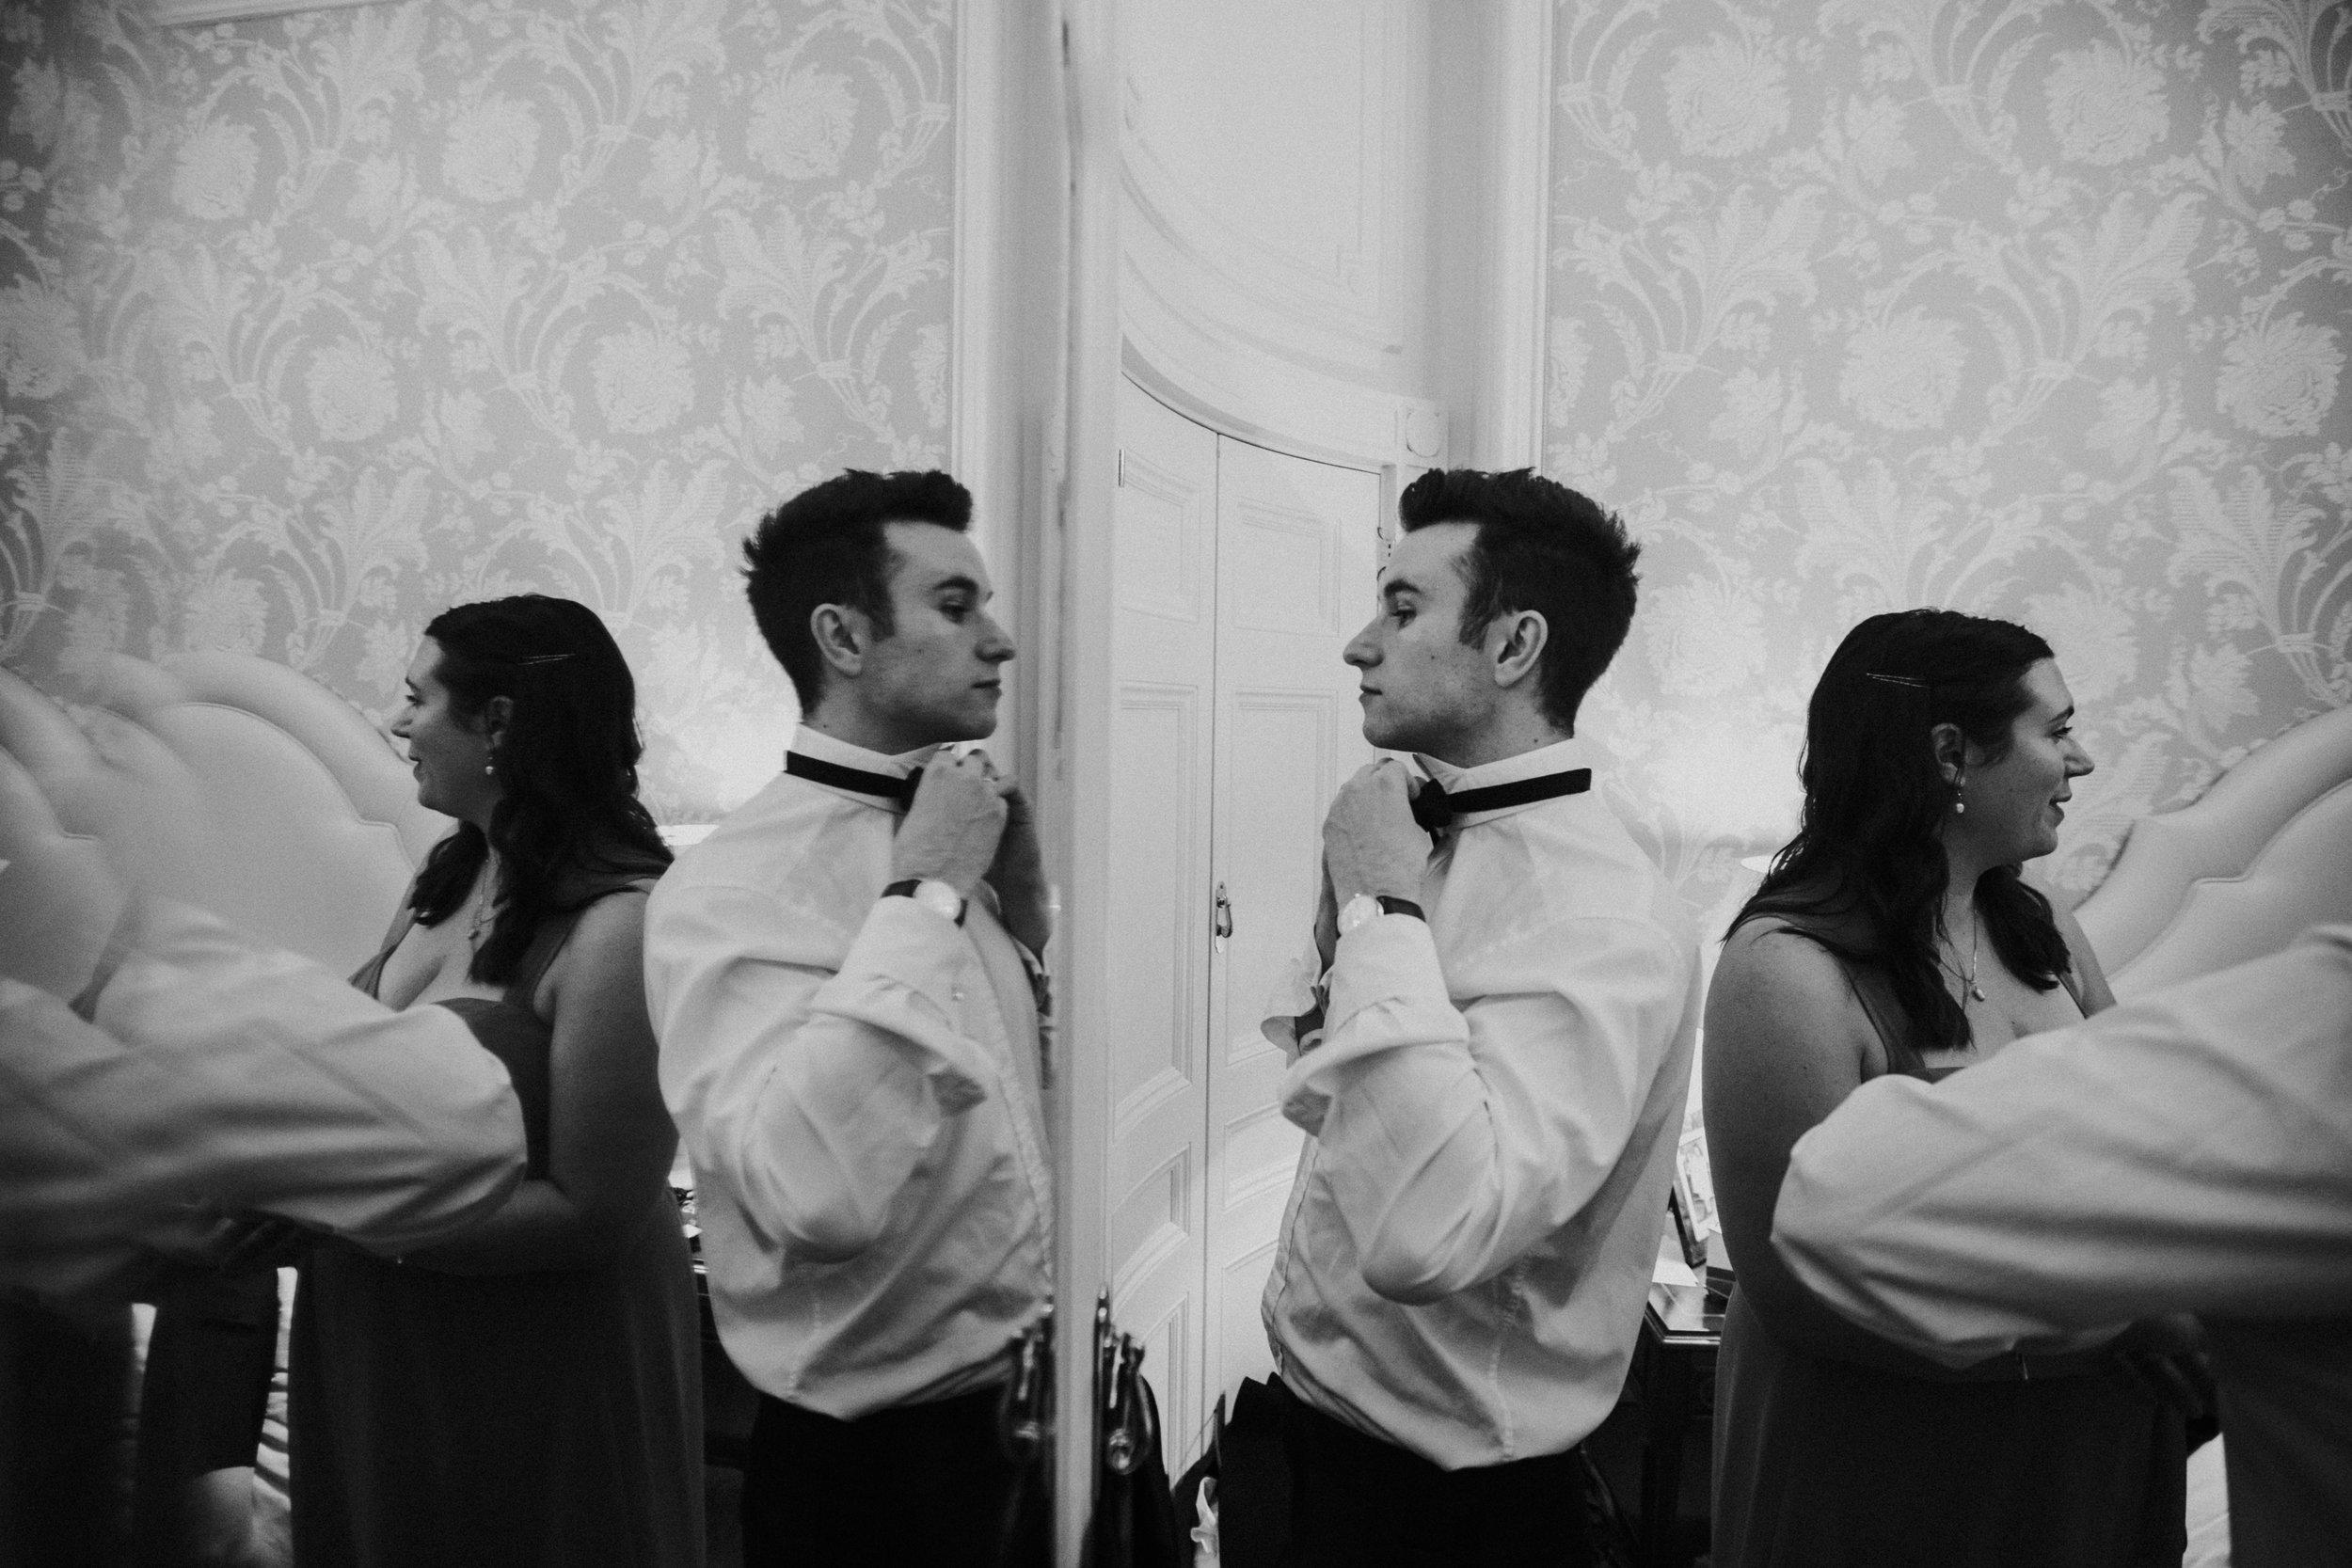 london-wedding-photography-wimbledon-wandsworth-town-hall-savoy-hotel-room-party-prep-chaos-90